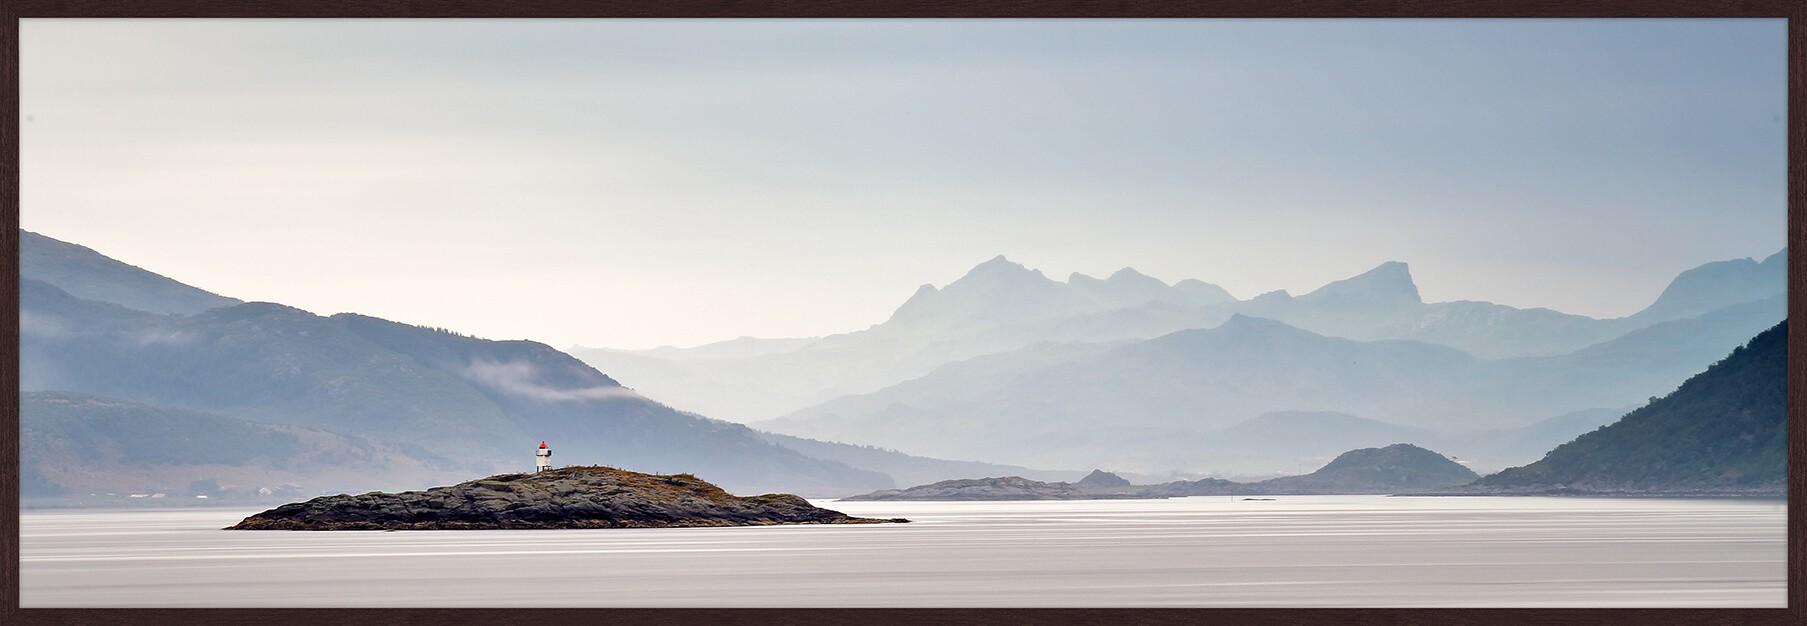 Quadro Landscape 153x53cm